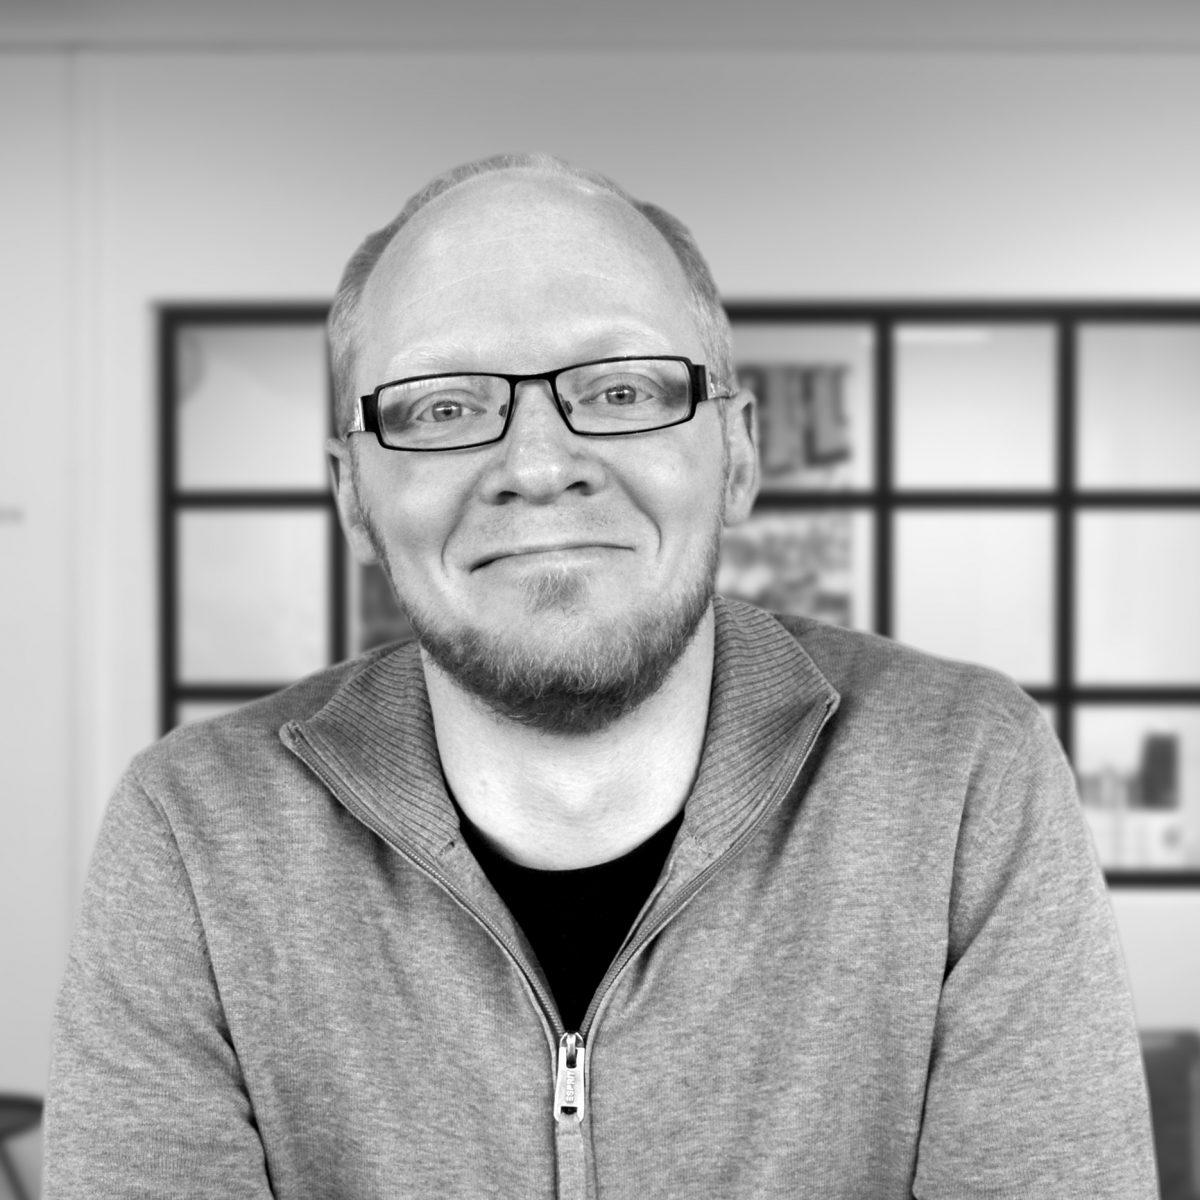 http://horisontgruppen.dk/wp-content/uploads/ANDERS_2019-1200x1200.jpg